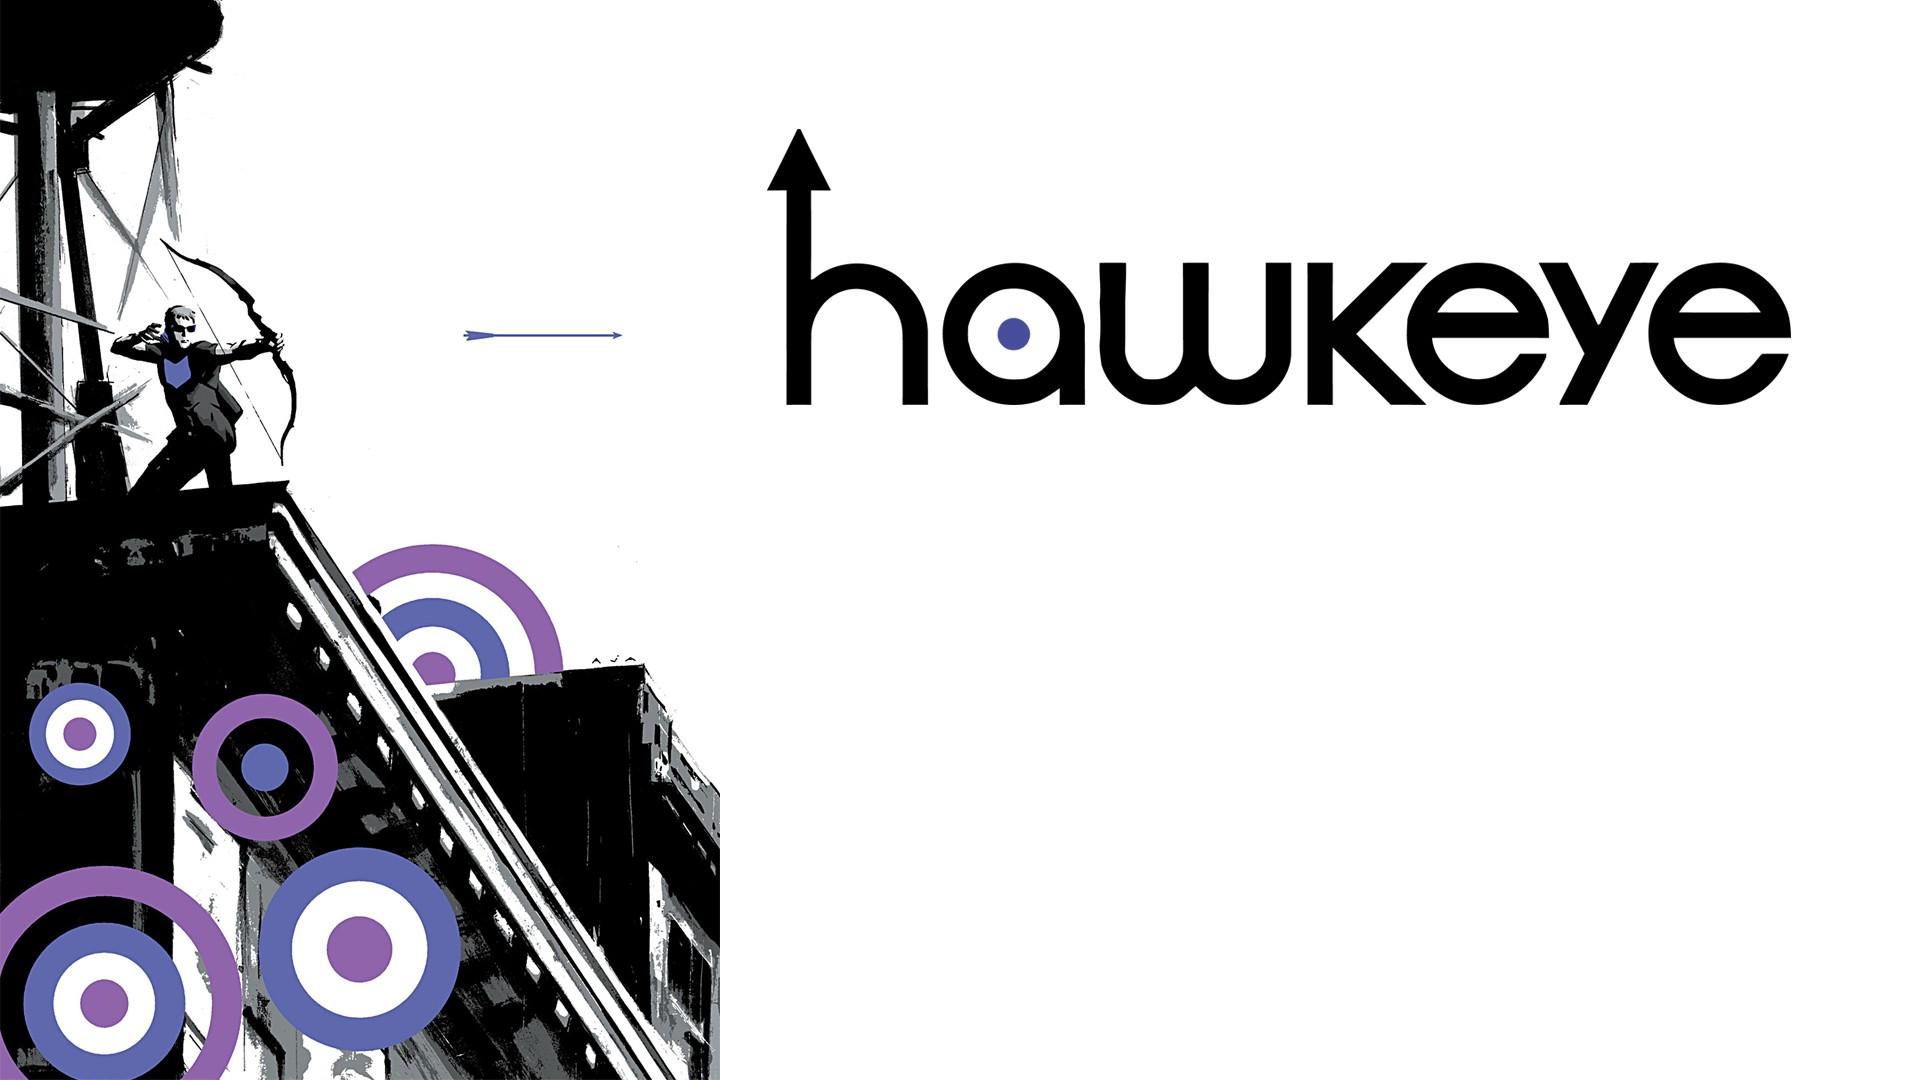 Hawkeye Computer Wallpapers Desktop Backgrounds 1920x1080 ID 1920x1080